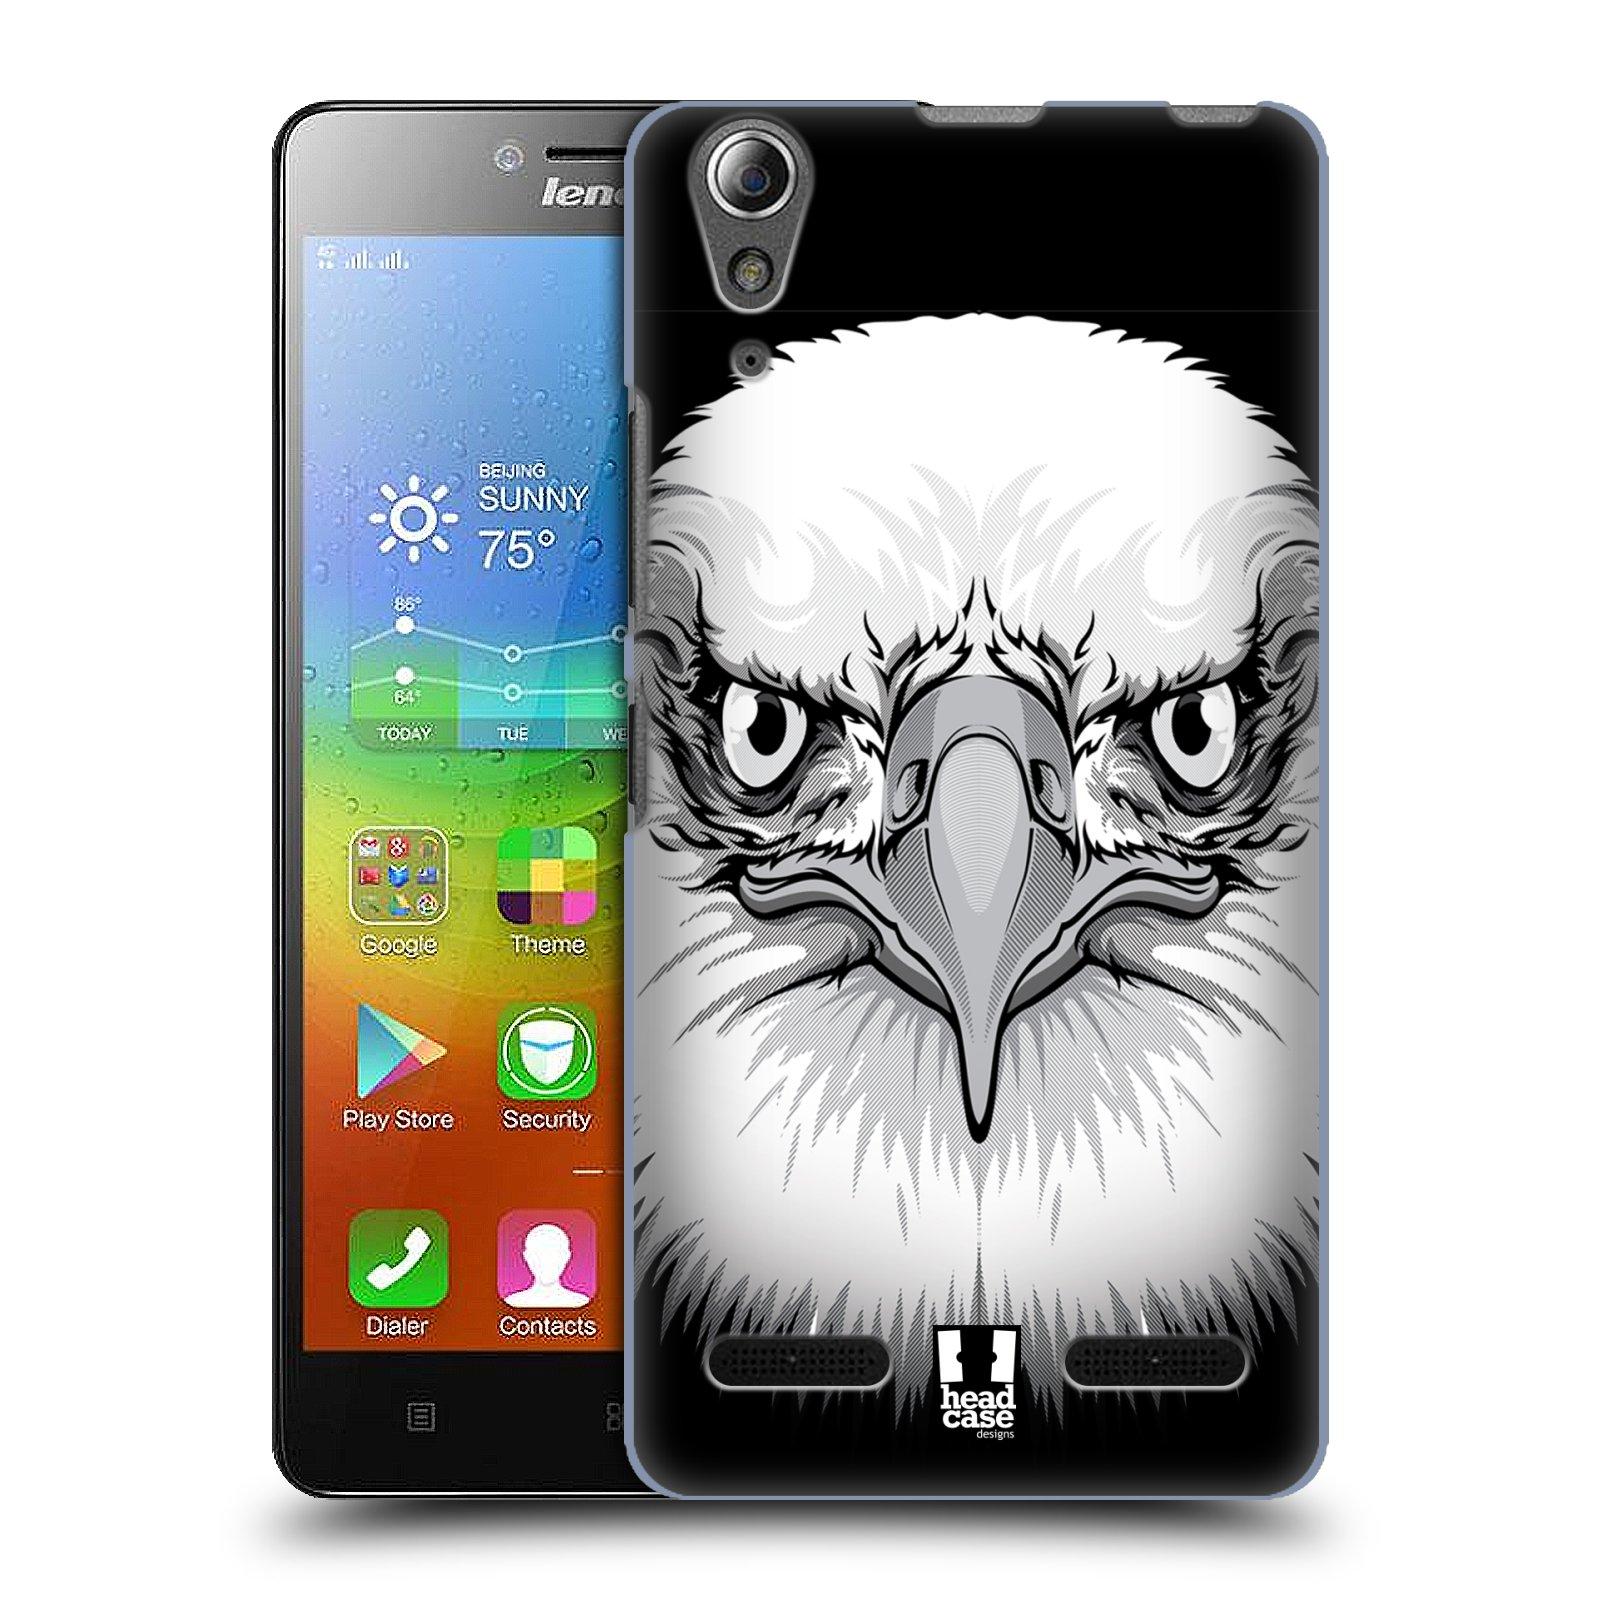 HEAD CASE pevný plastový obal na mobil LENOVO A6000 / A6000 PLUS vzor Zvíře kreslená tvář orel